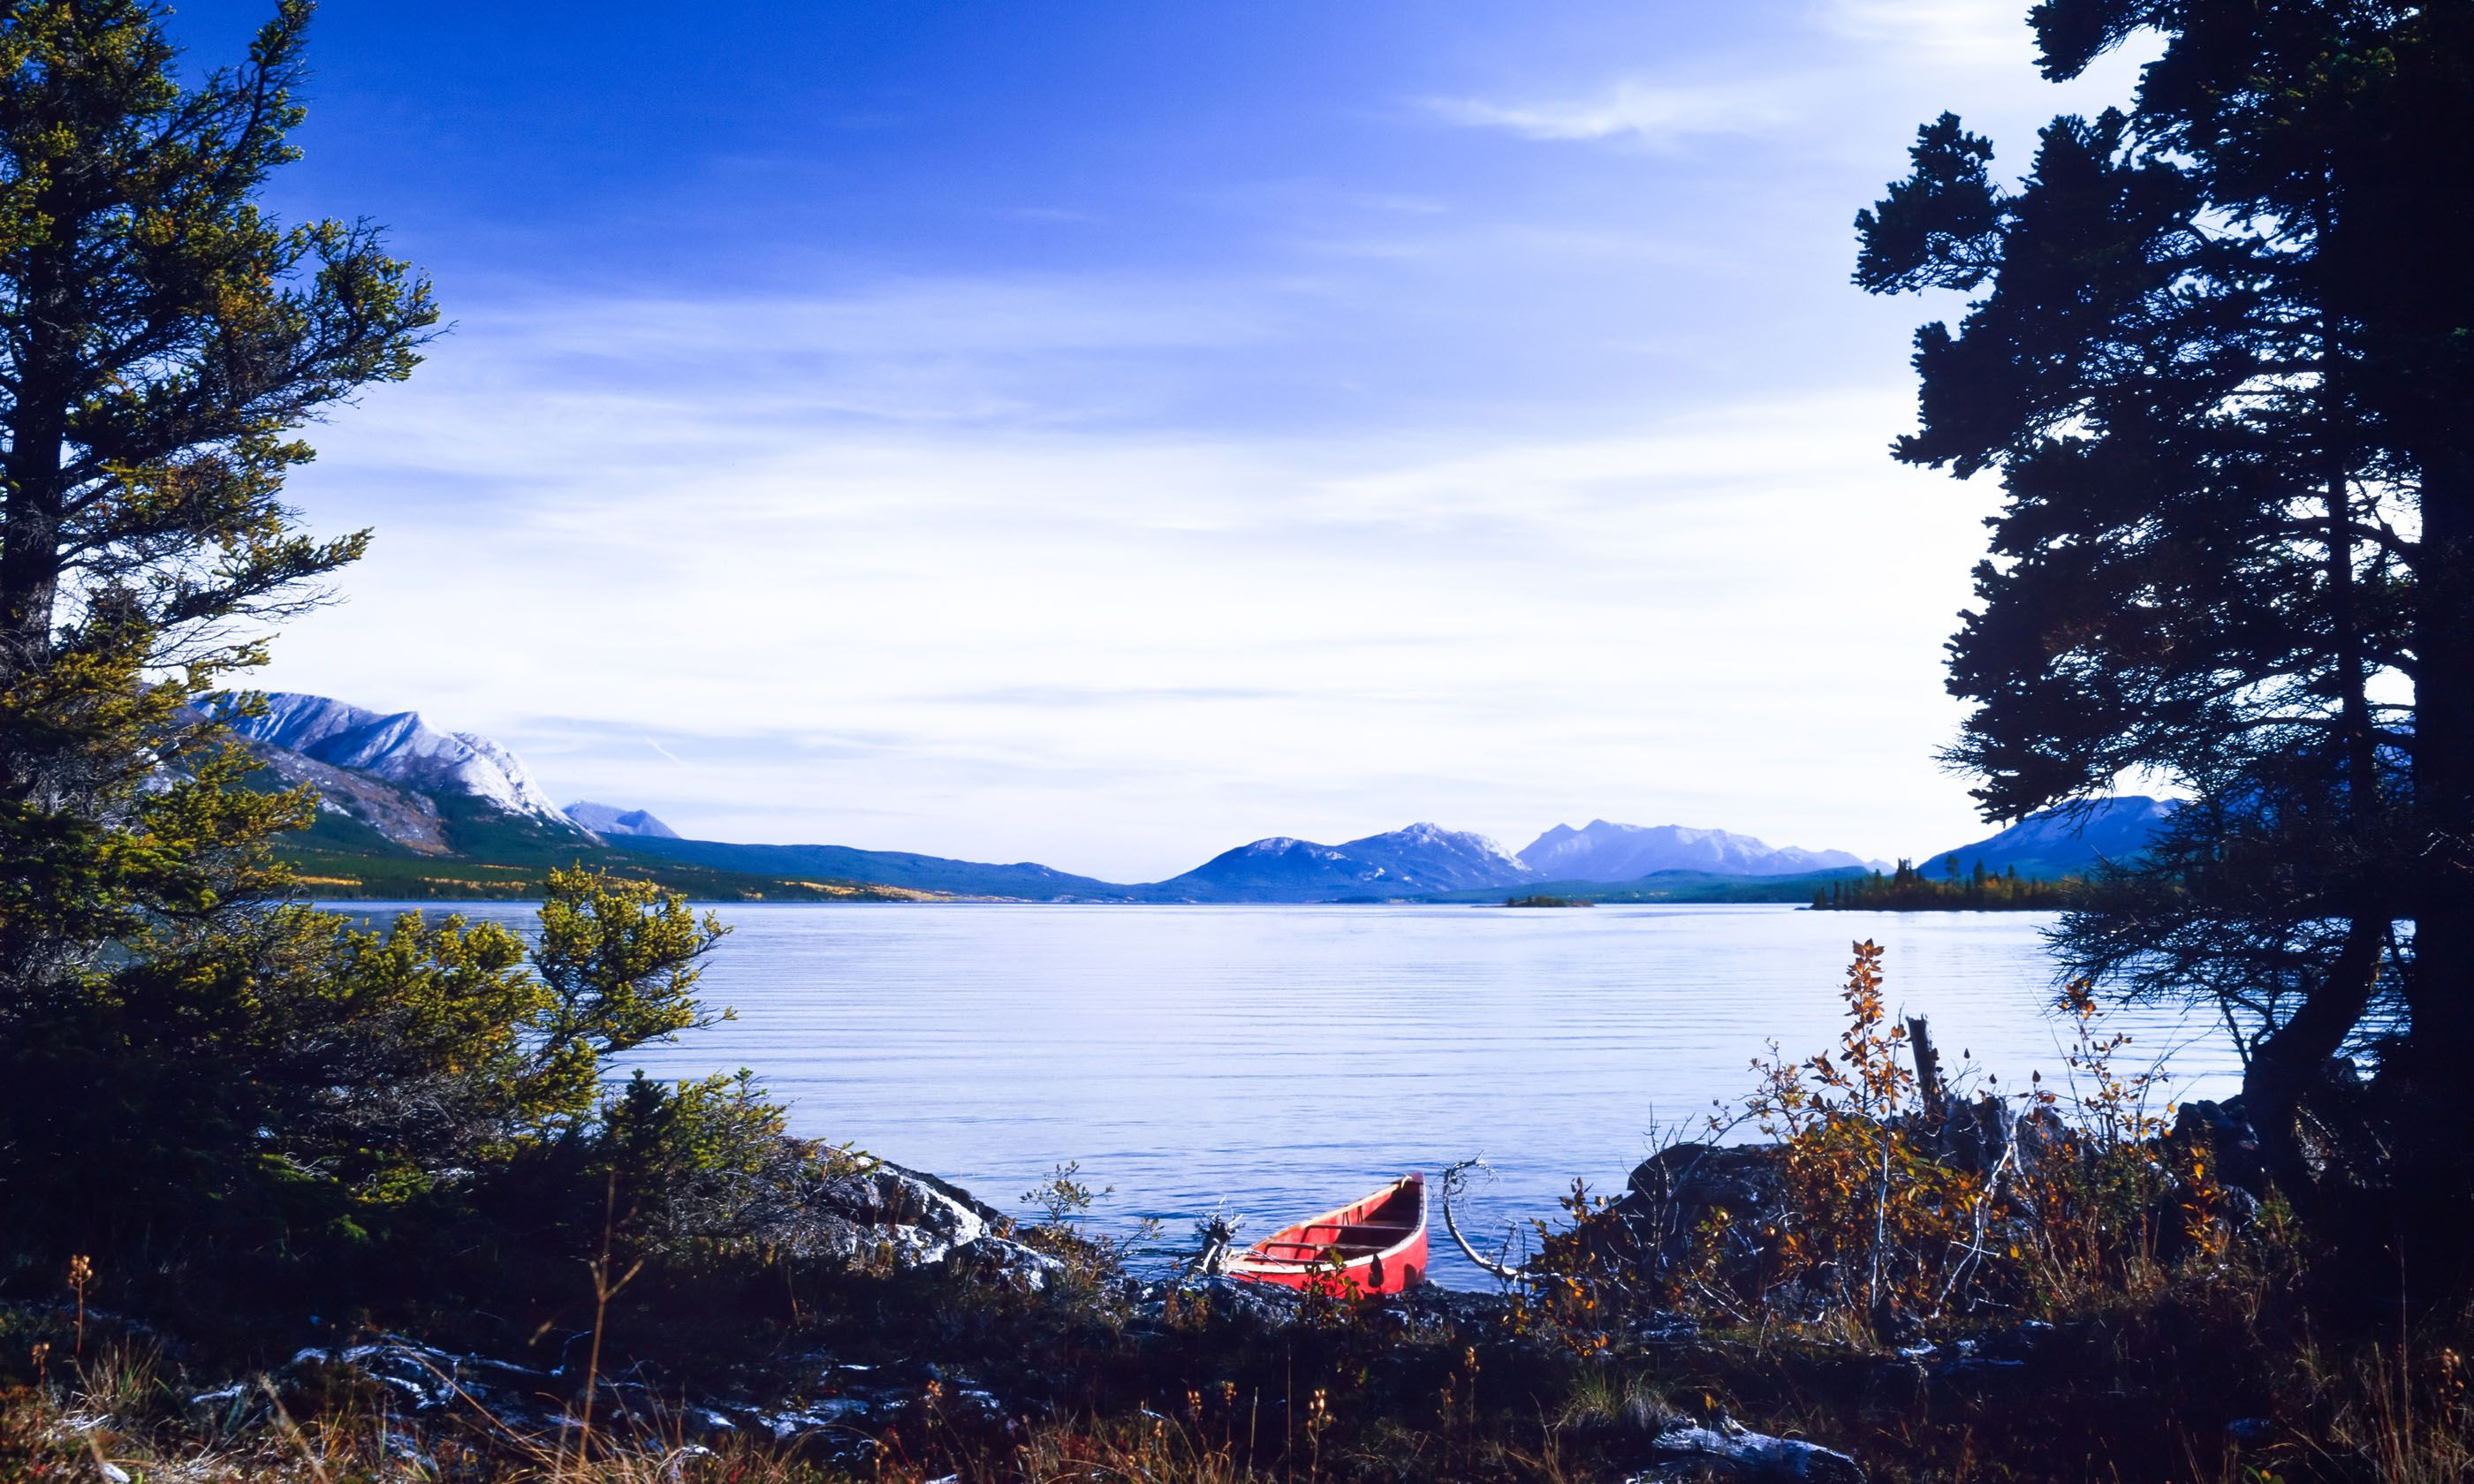 Canoe on the Yukon (Dreamstime)